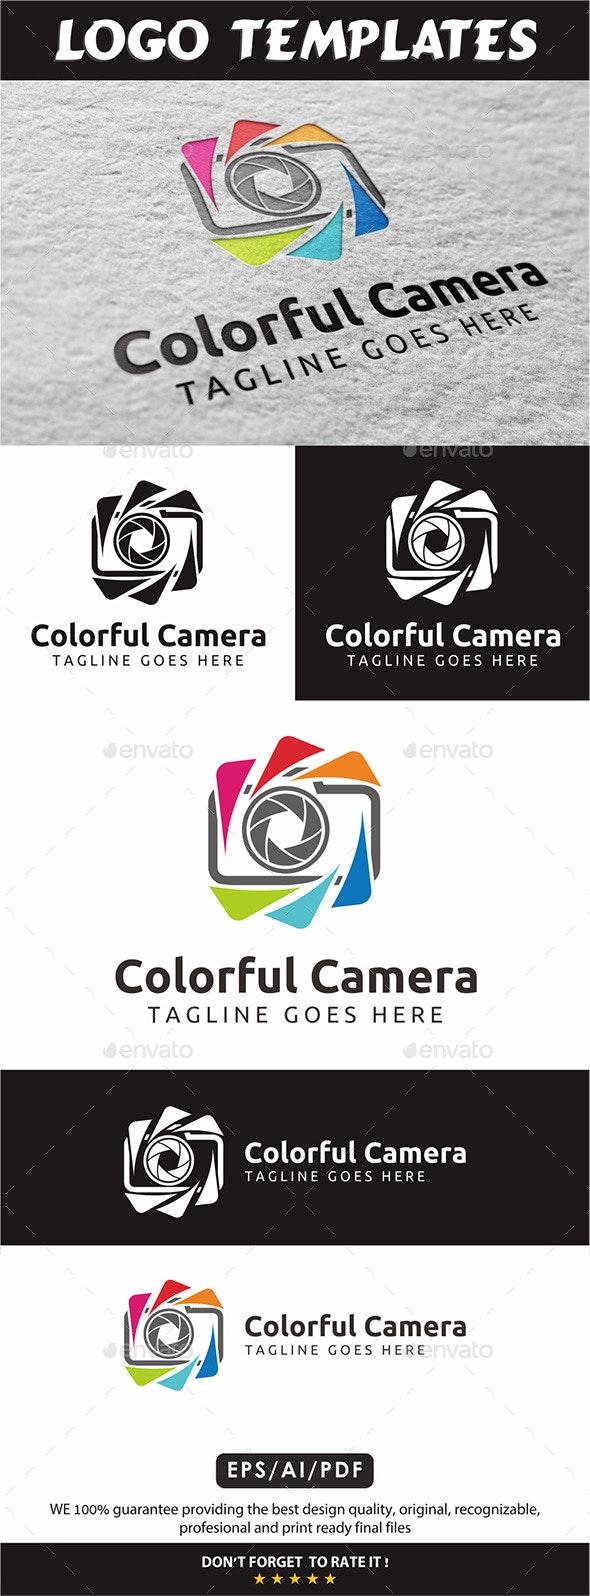 Colorful Camera V3 - Vector Abstract